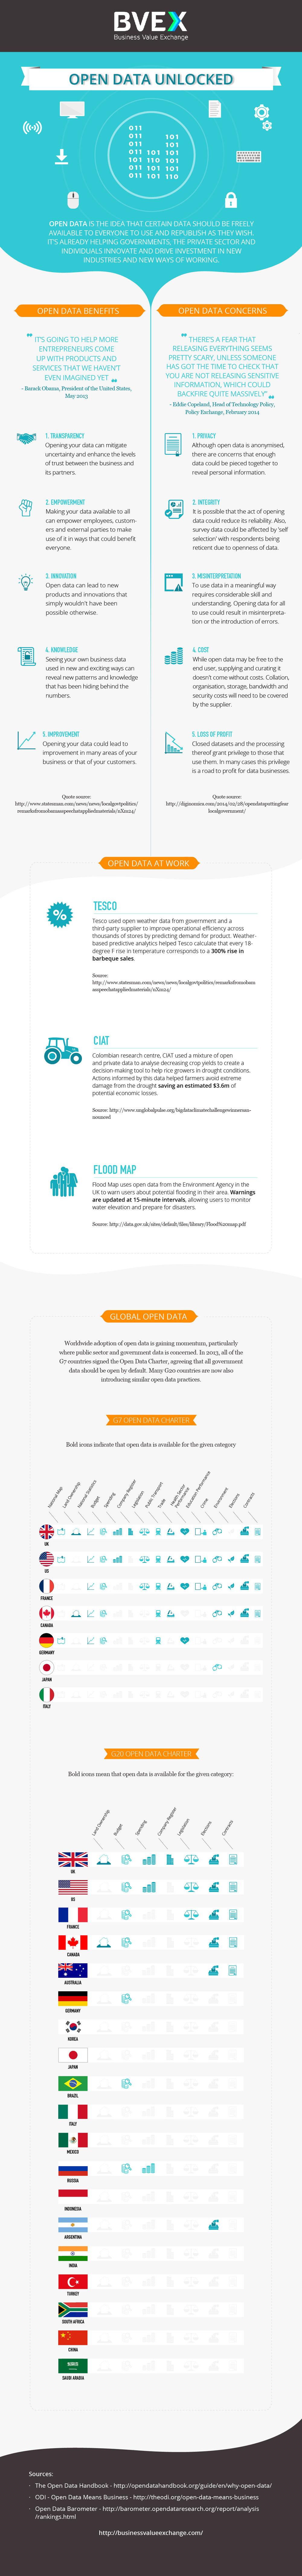 BVEX infographic open data unlocked